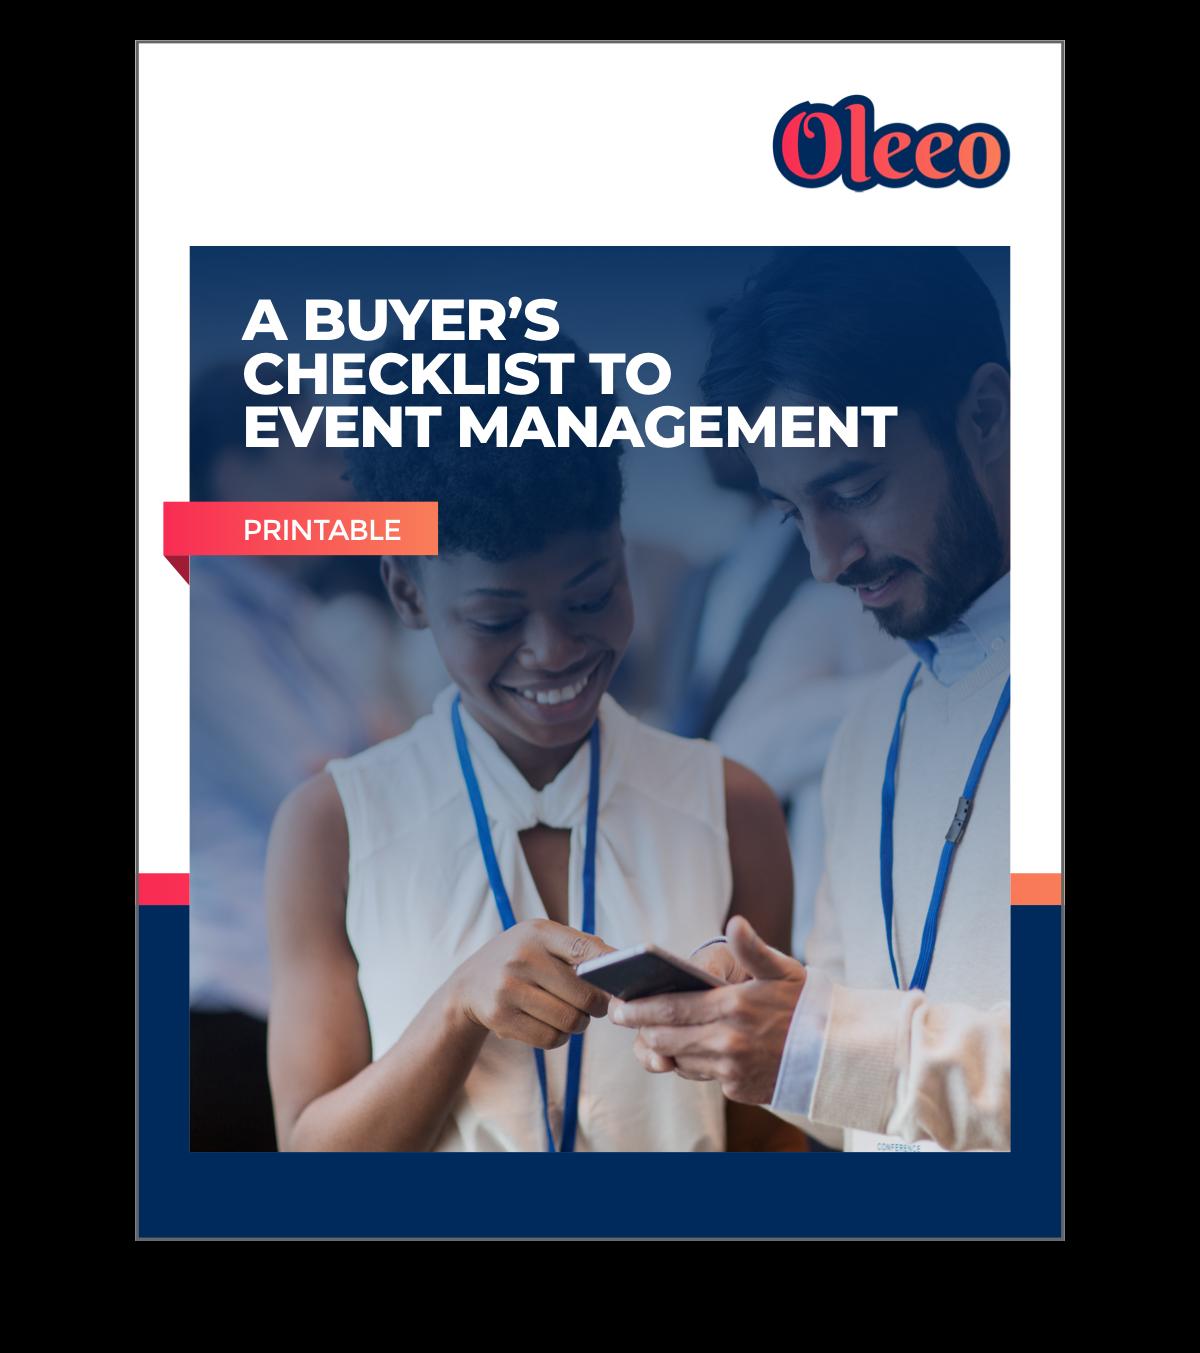 (Large)-[Printable]-Buyers-Checklist-Events-Management-Mockup